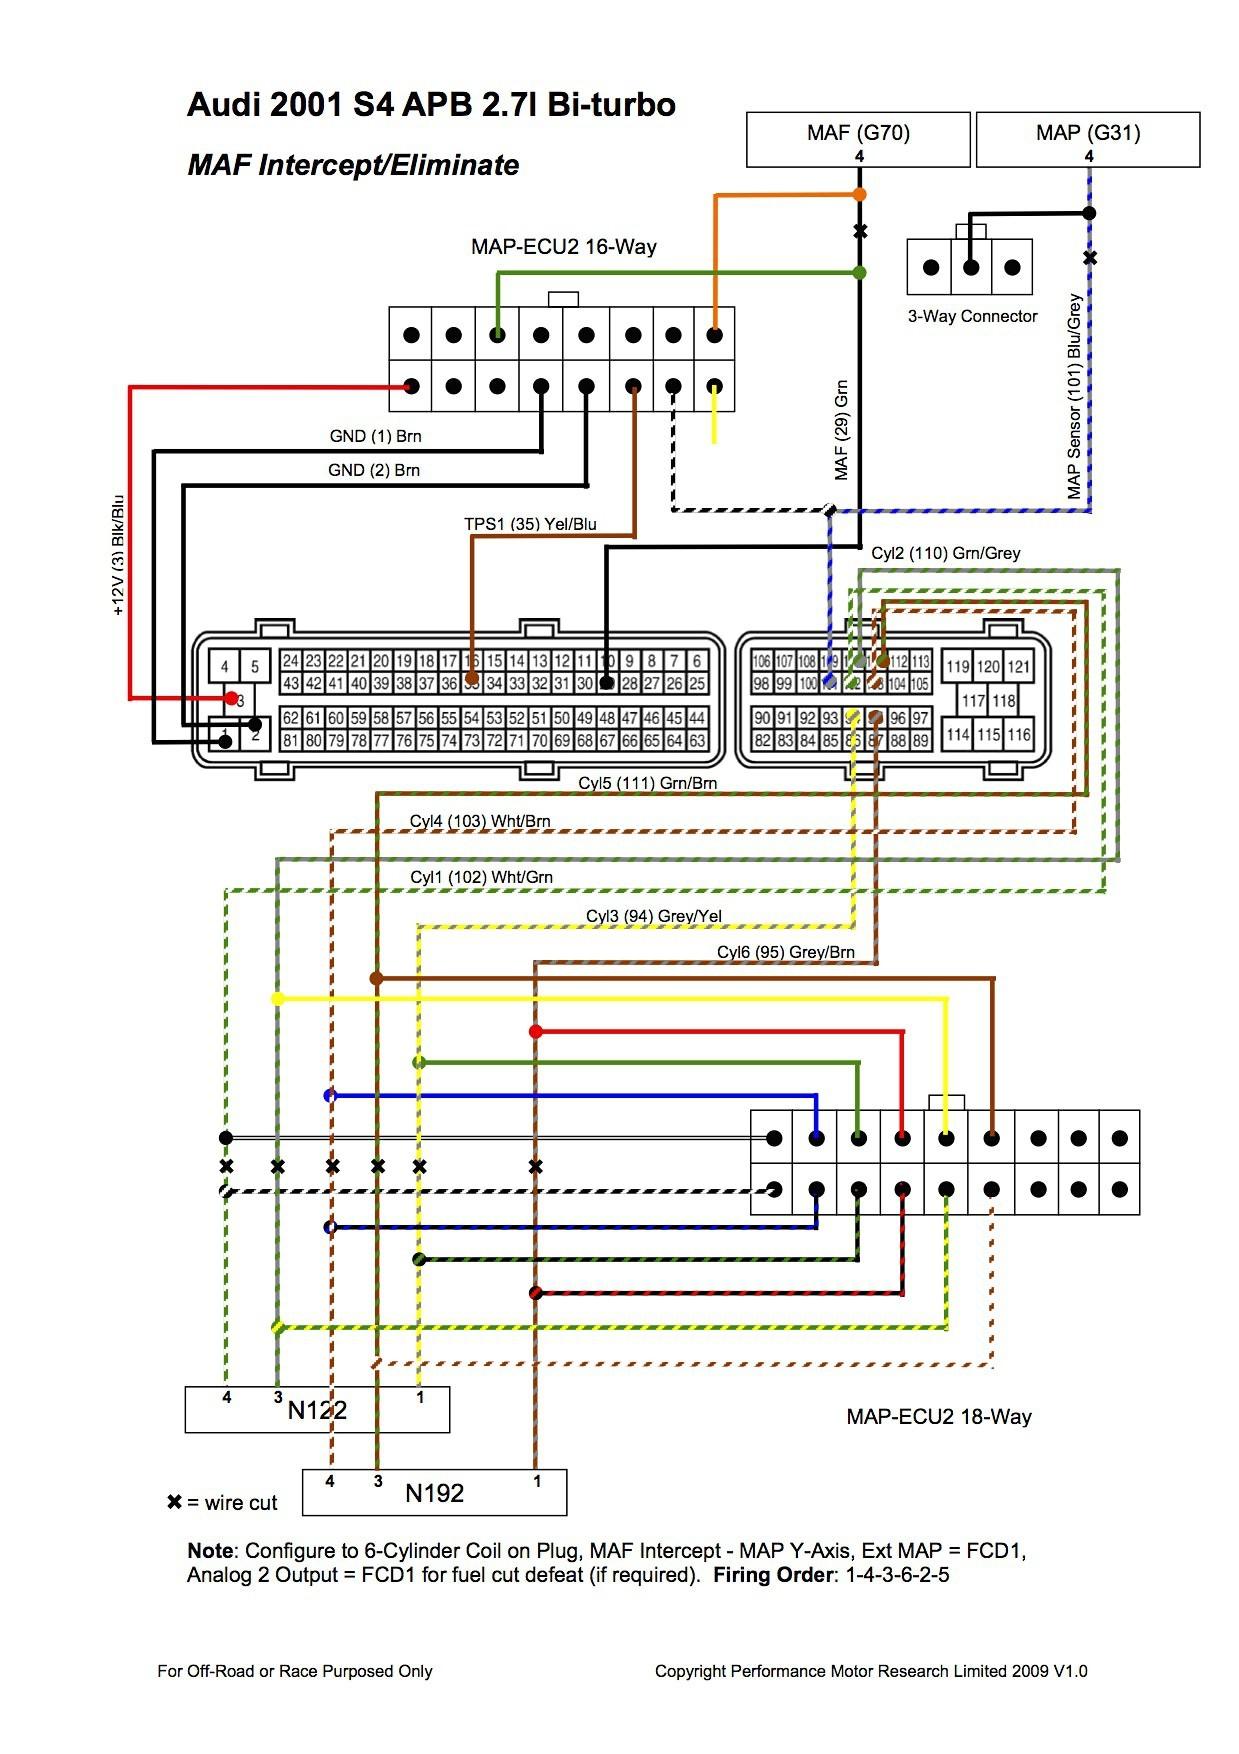 Admirable 1990 Benz Radio Wiring Wiring Library Wiring Cloud Peadfoxcilixyz